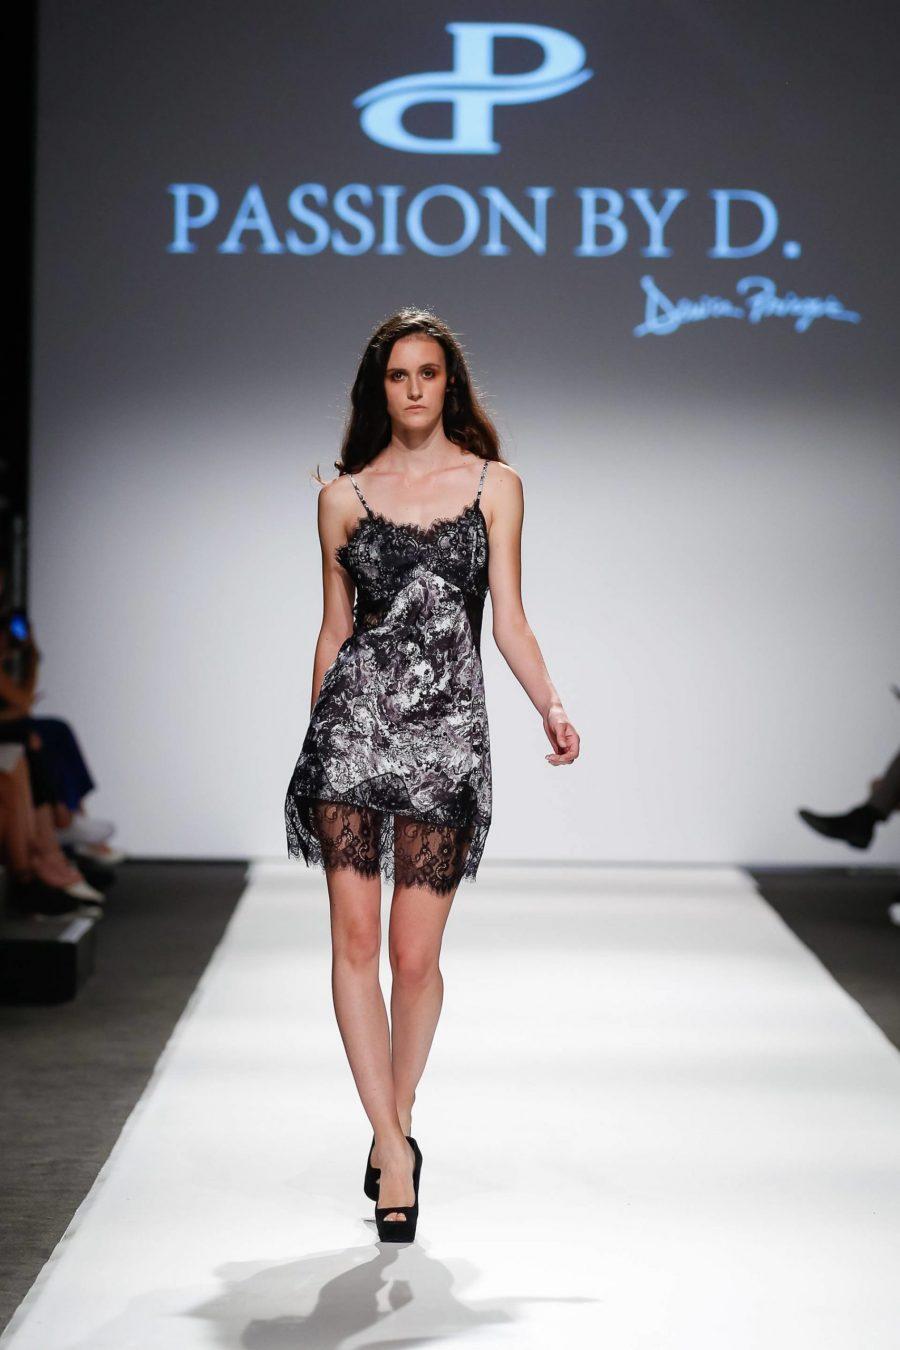 Rochie tip furou cu dantela Vienna Fashion week 2019 - Passion by D